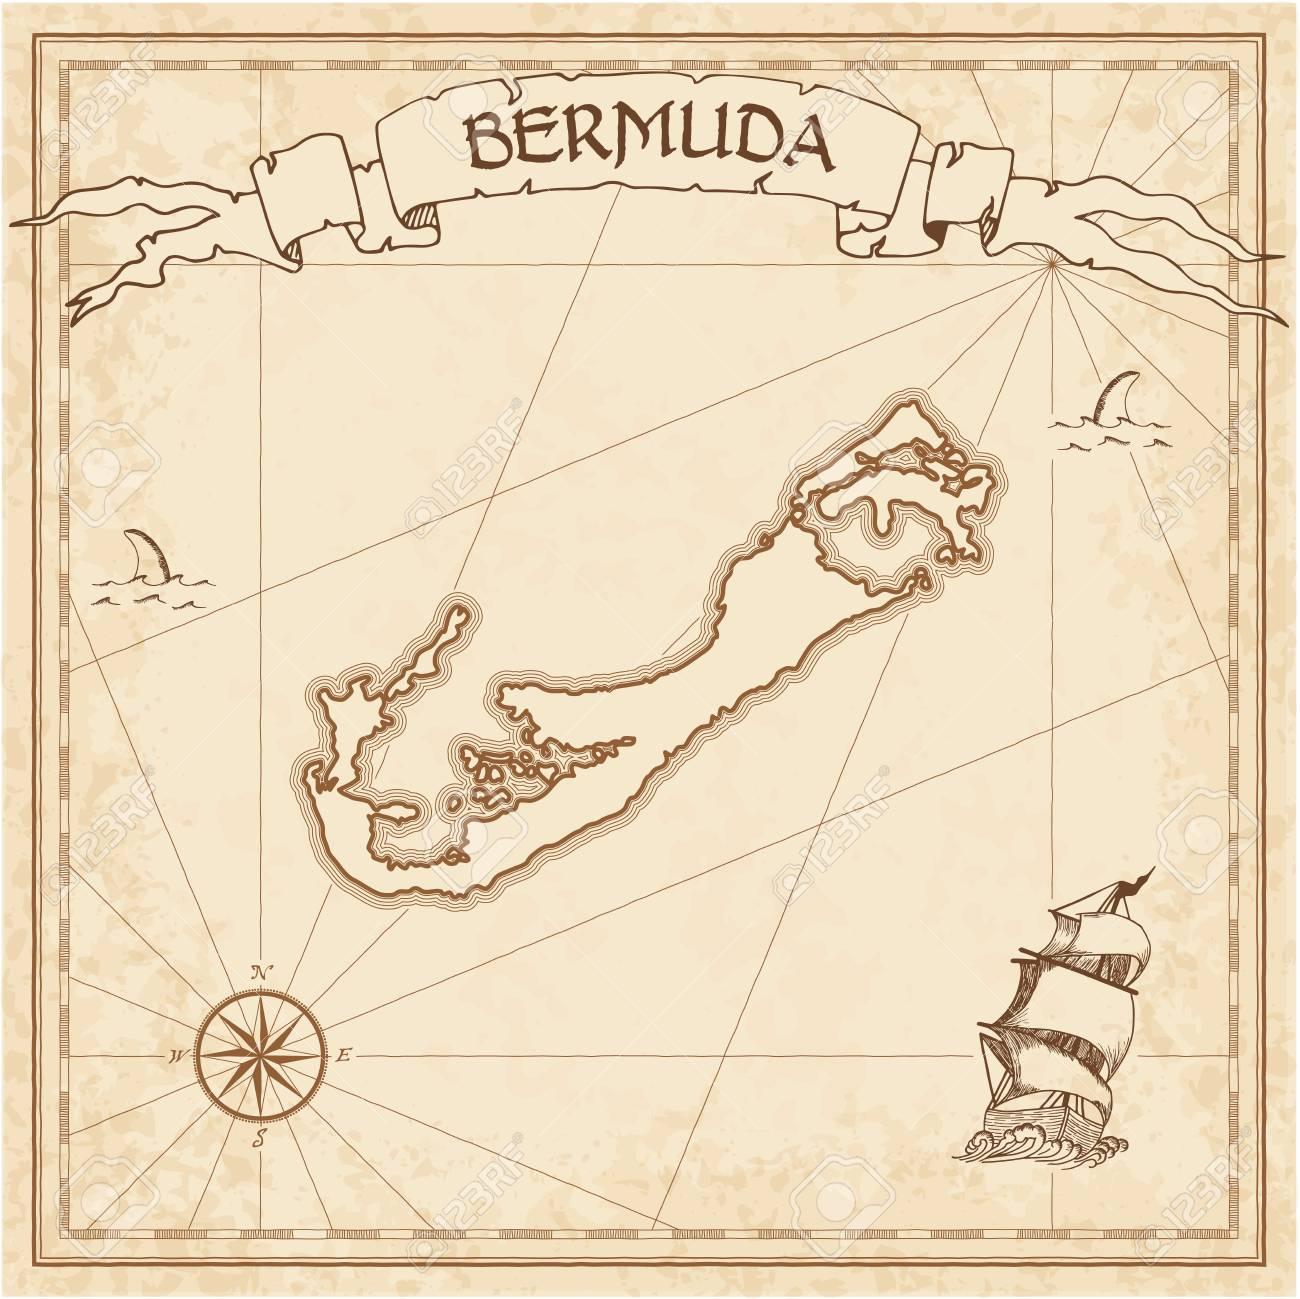 Bermuda old treasure map. Sepia engraved template of pirate island..